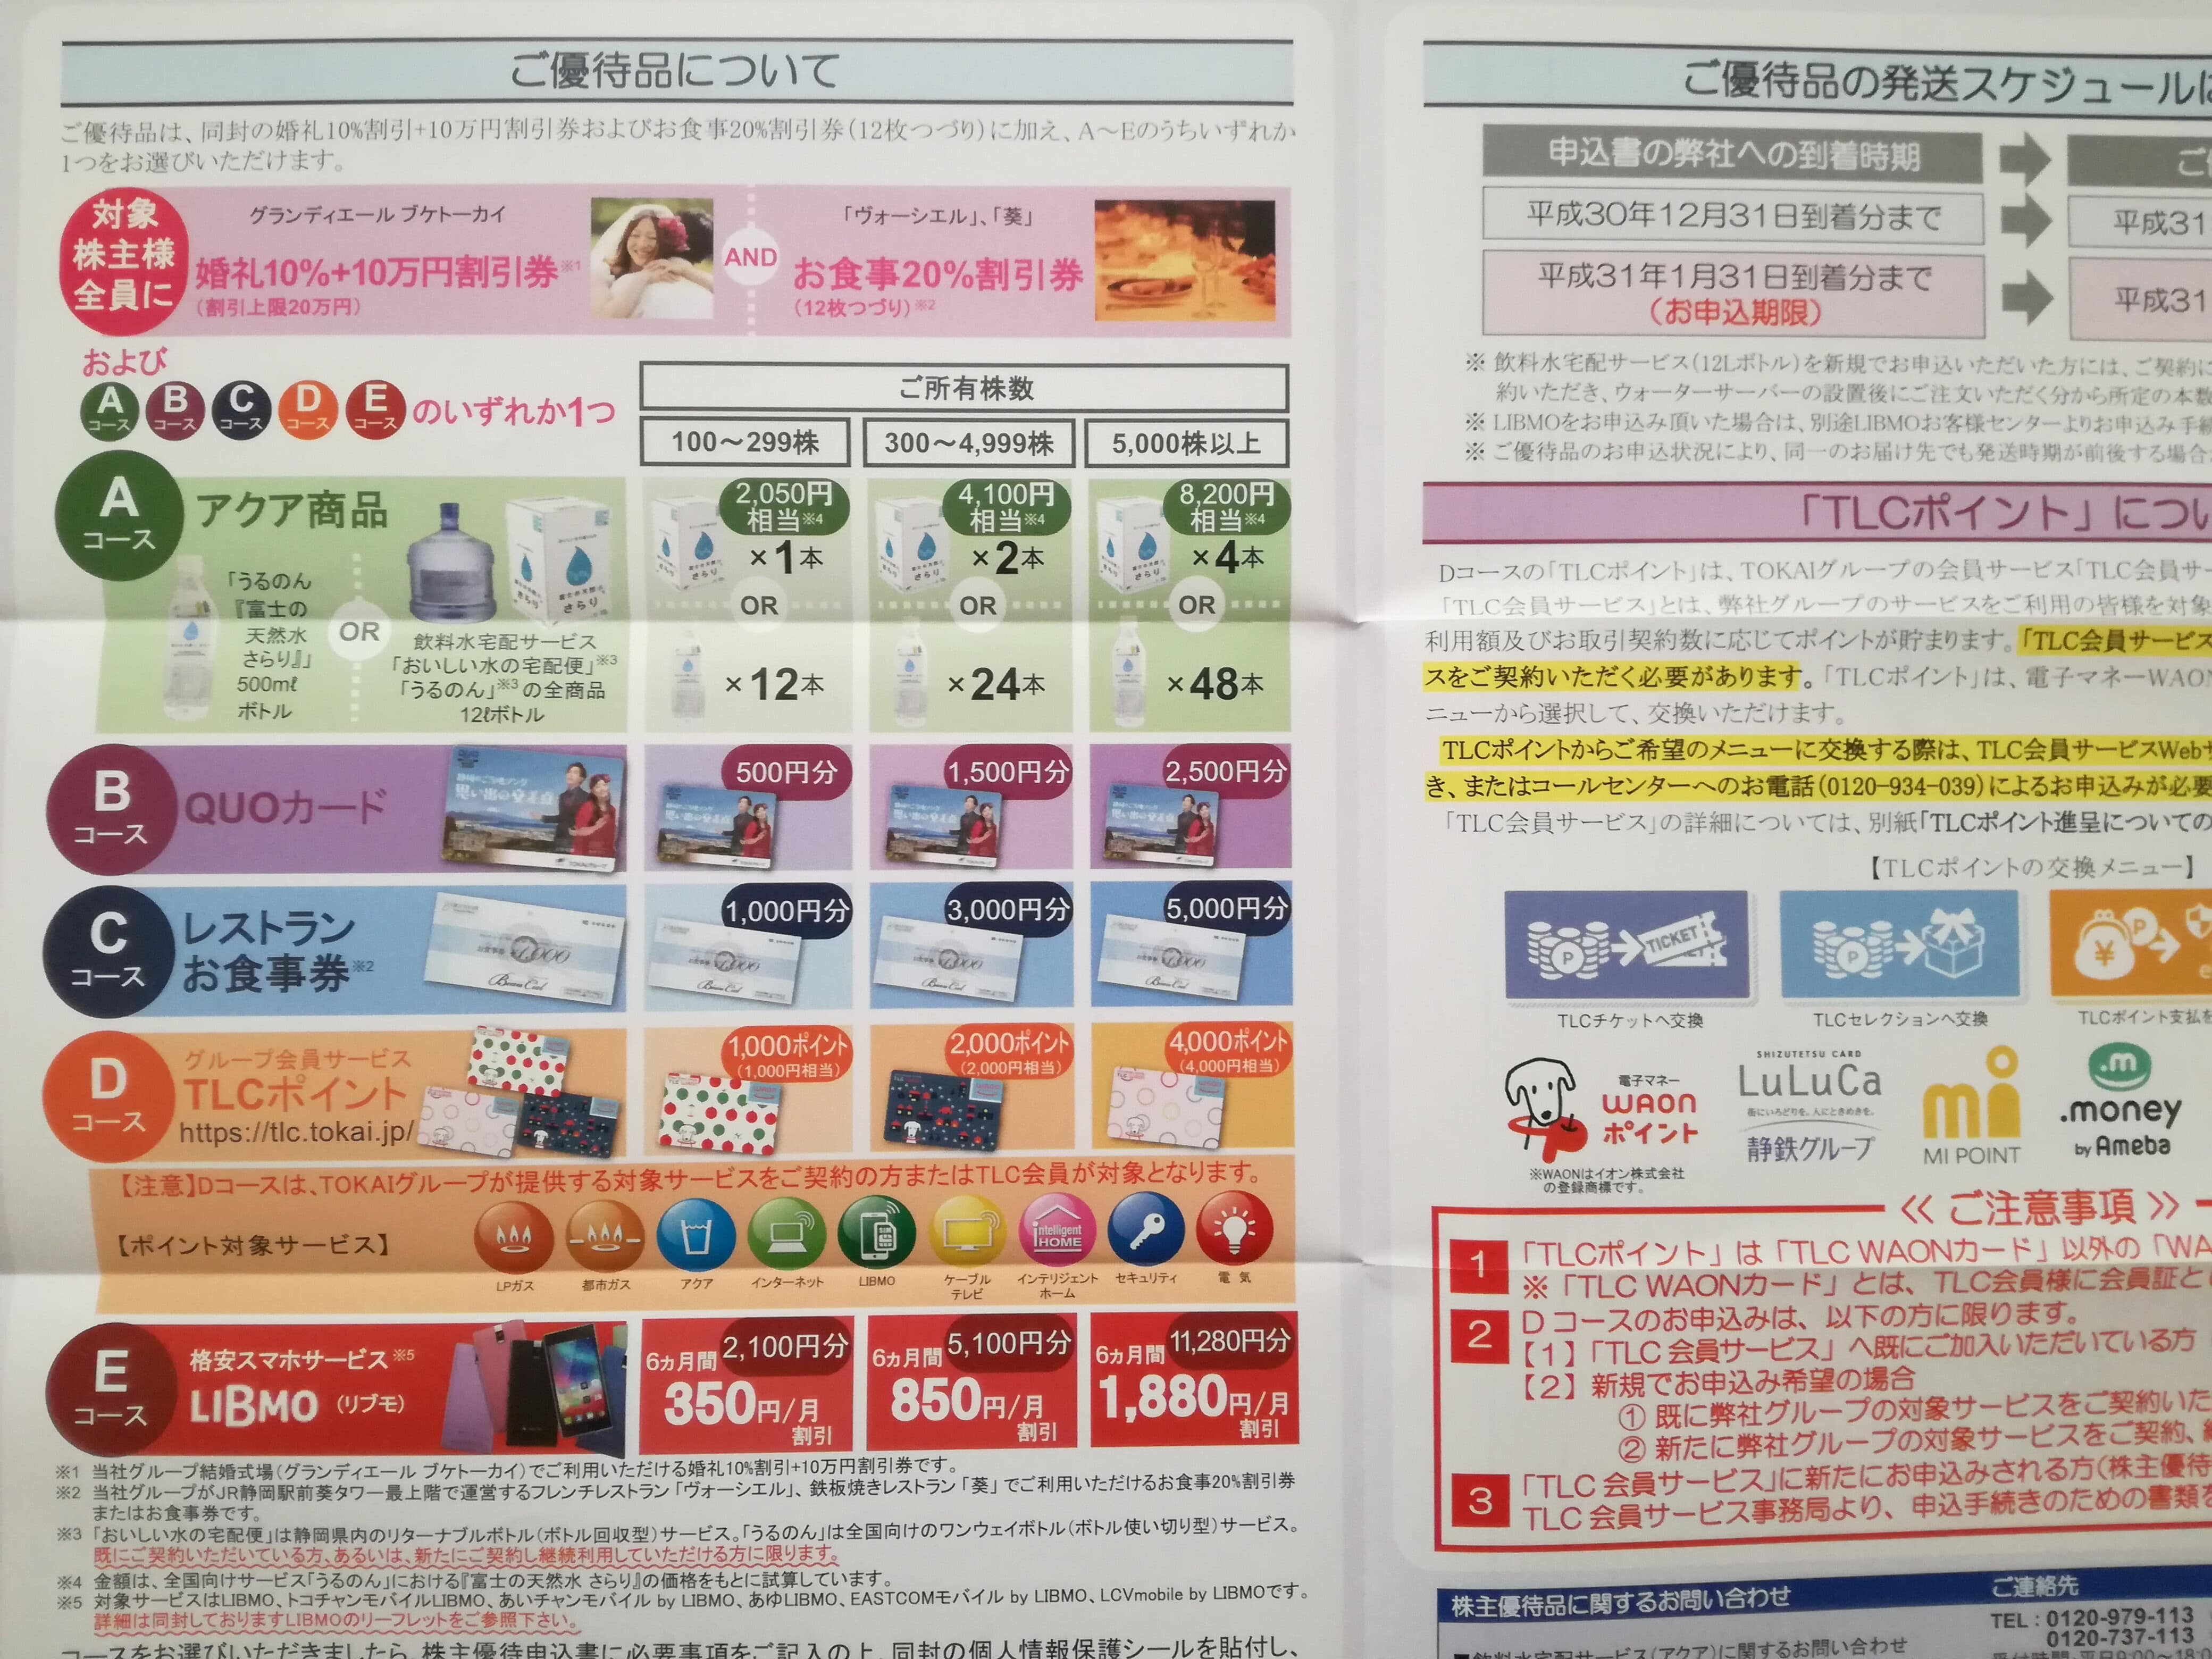 TOKAIホールディングス(3167)から株主優待案内が到着!格安スマホサービス「LIBMO」の割引に使います!